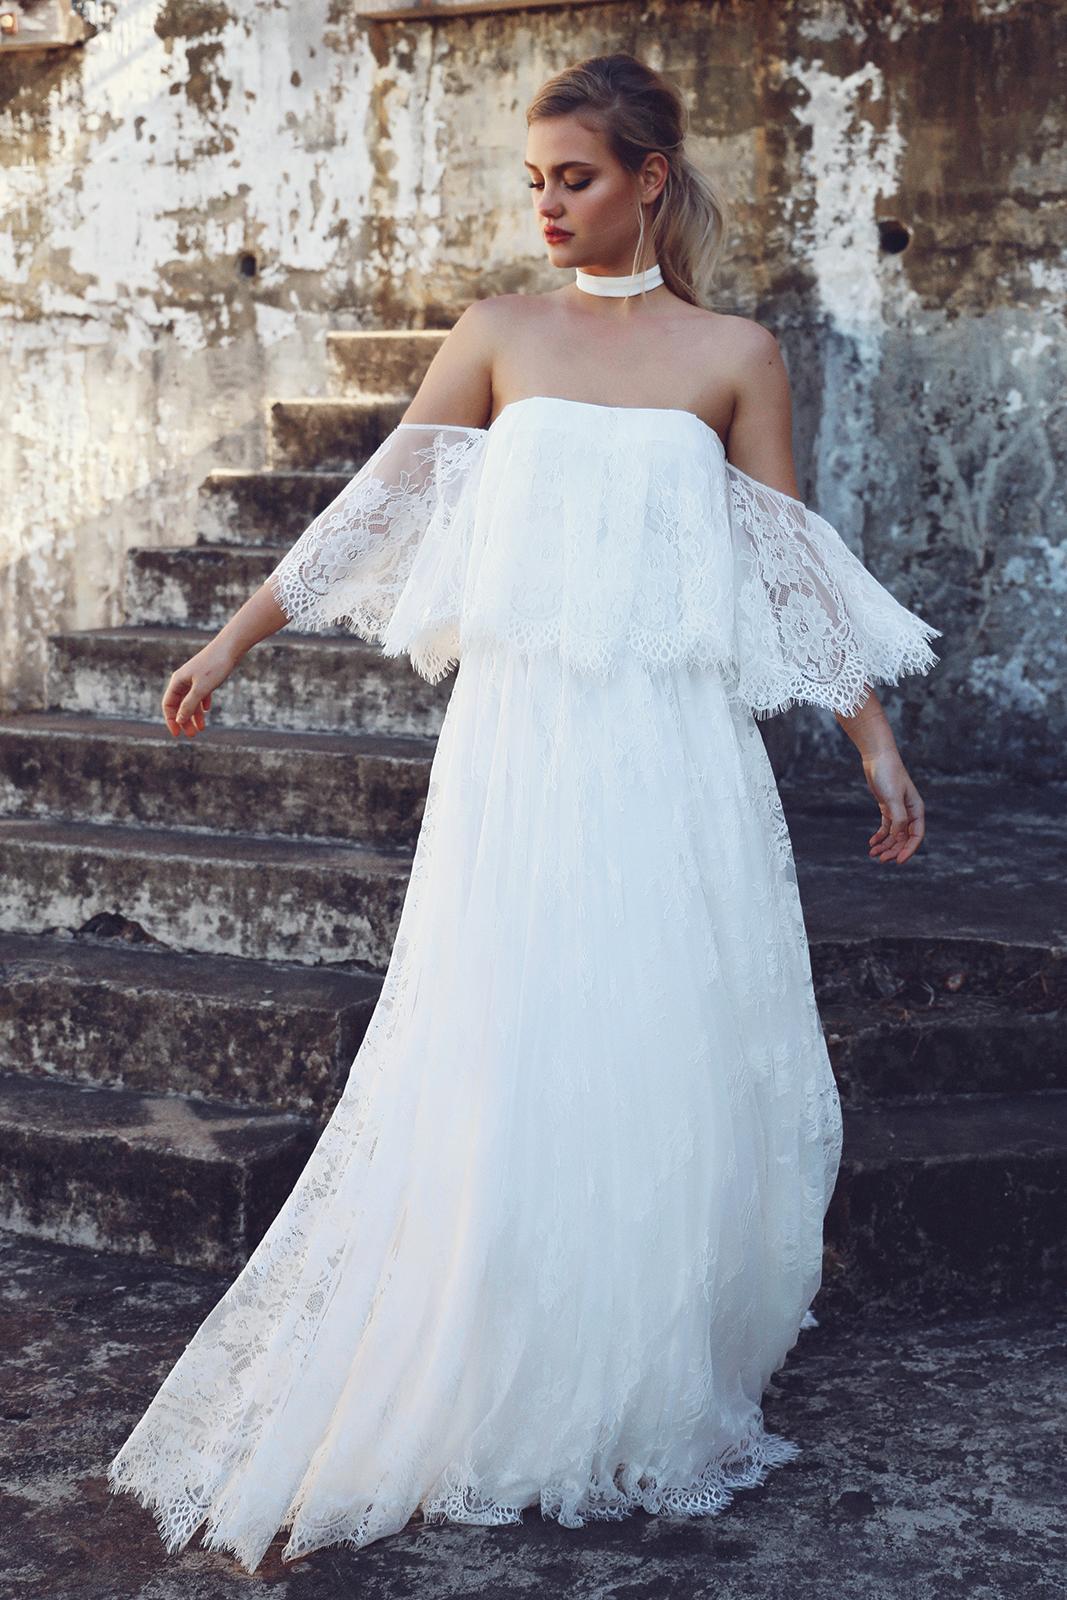 Wedding Dress Designer | Grace Loves Lace Florence Gown | Love Find Co.